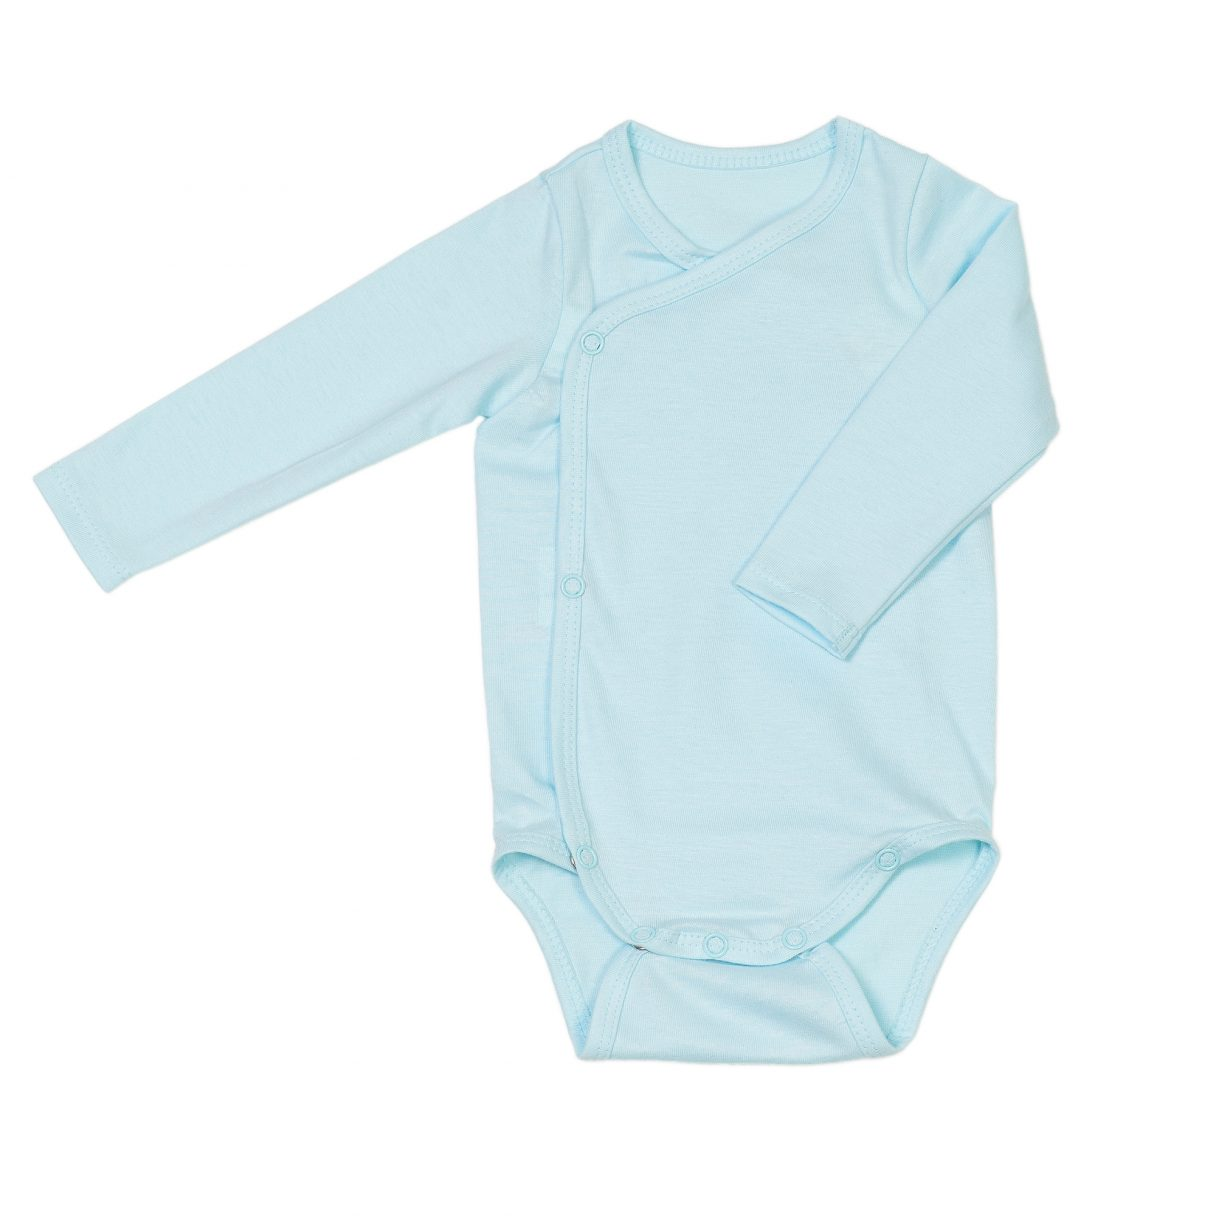 Newborn organic cotton baby bodysuit turquoise